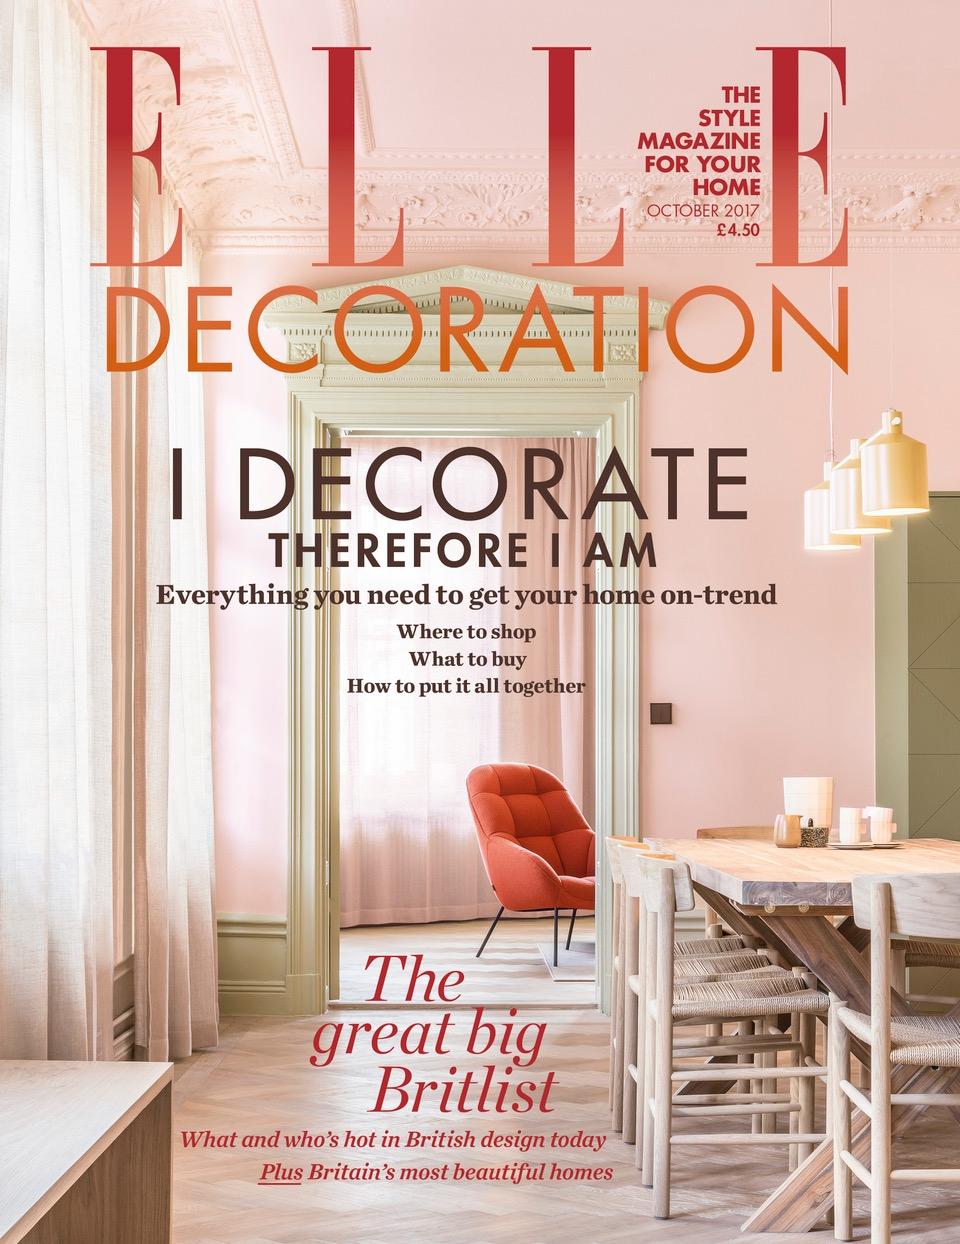 >> Elle Decoration Oct 2017